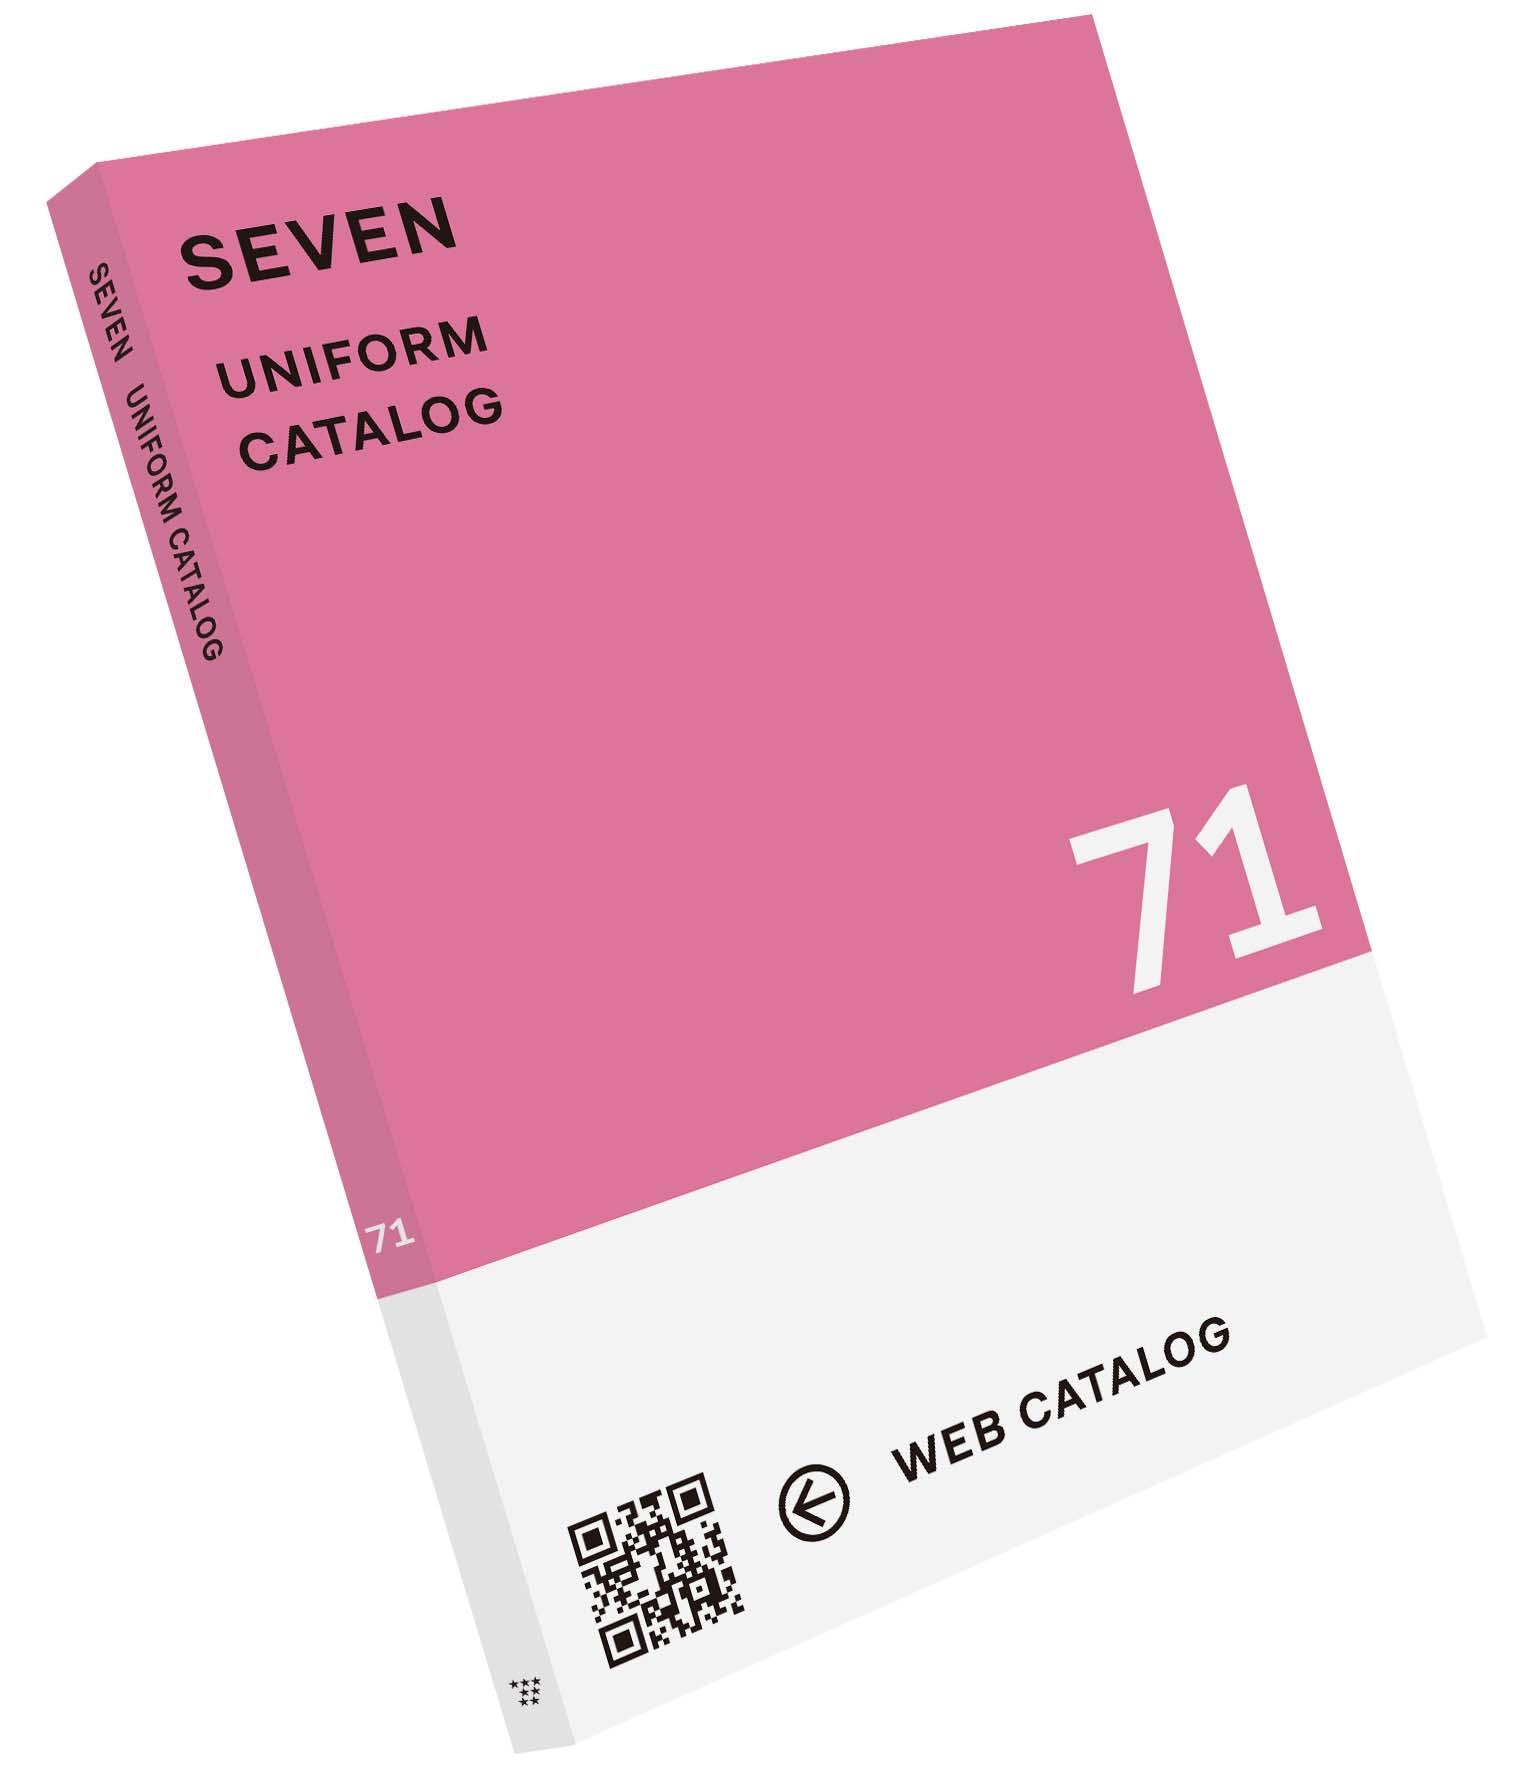 SEVEN UNIFOM CATALOG 71